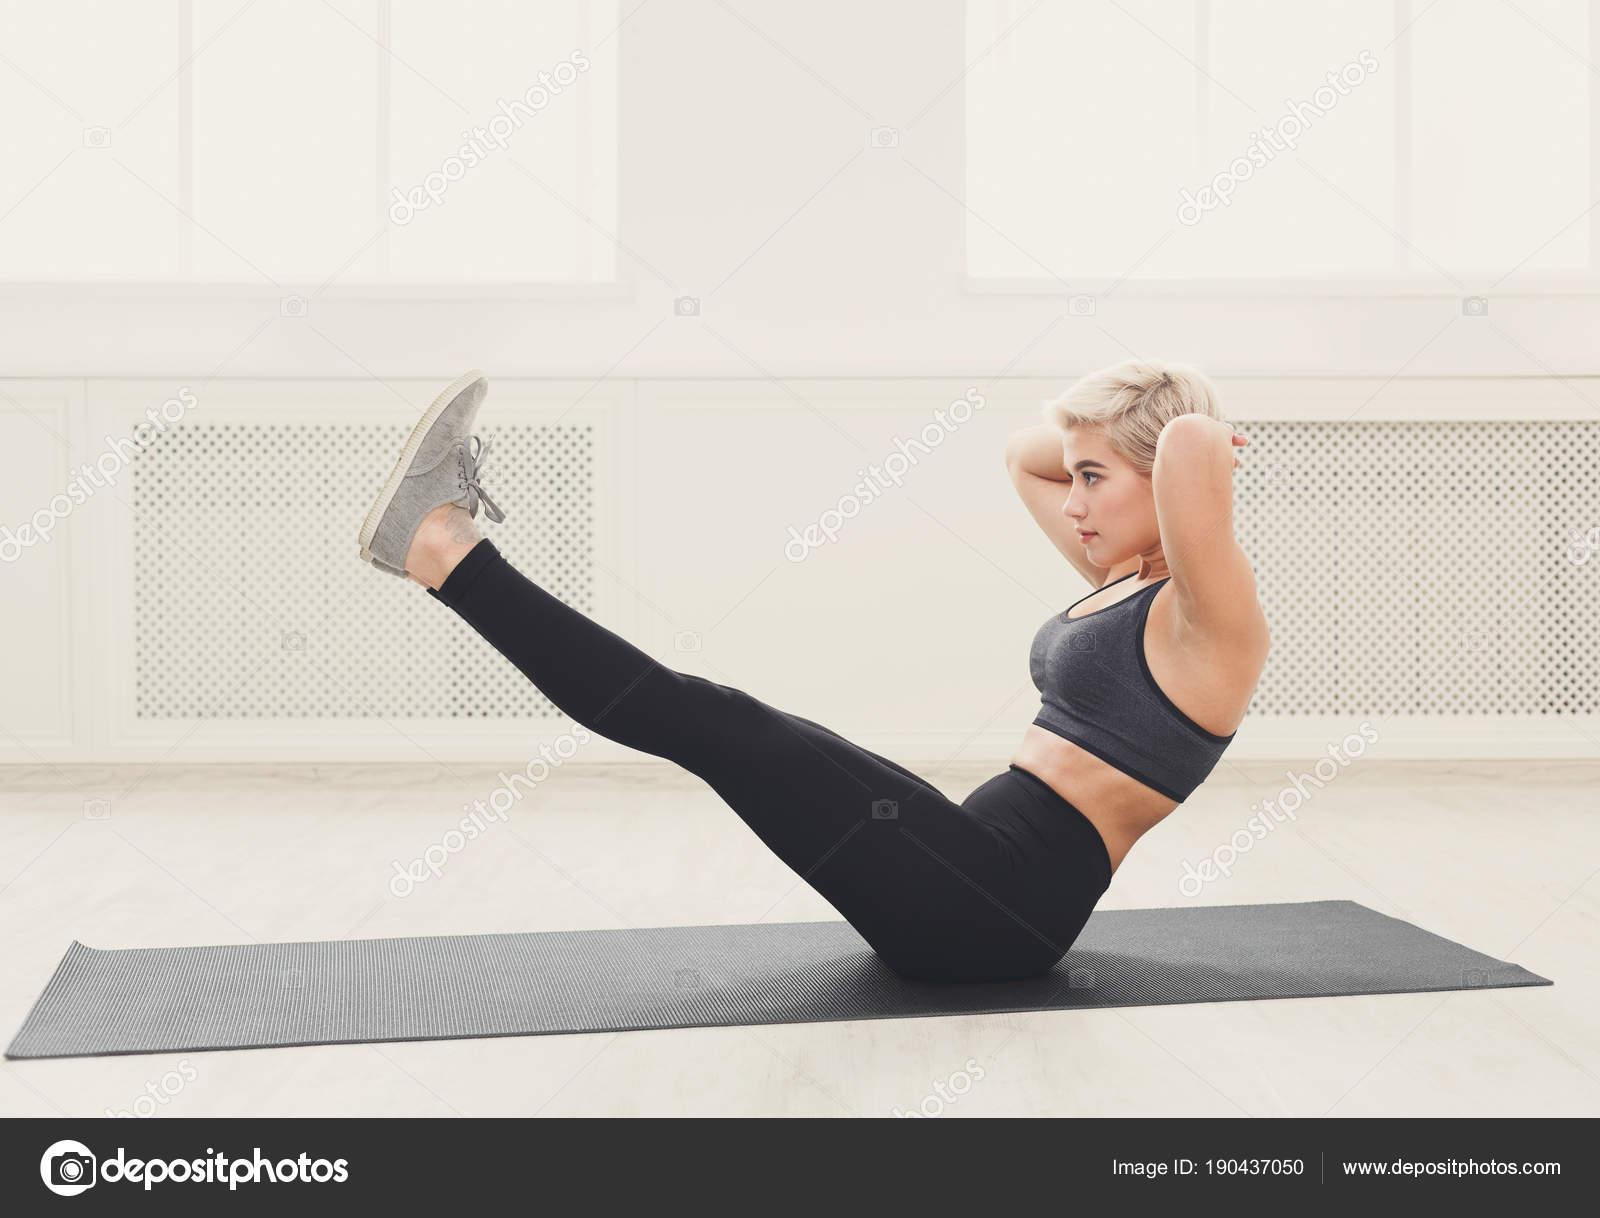 Woman Training Yoga In Boat Pose Stock Photo C Milkos 190437050